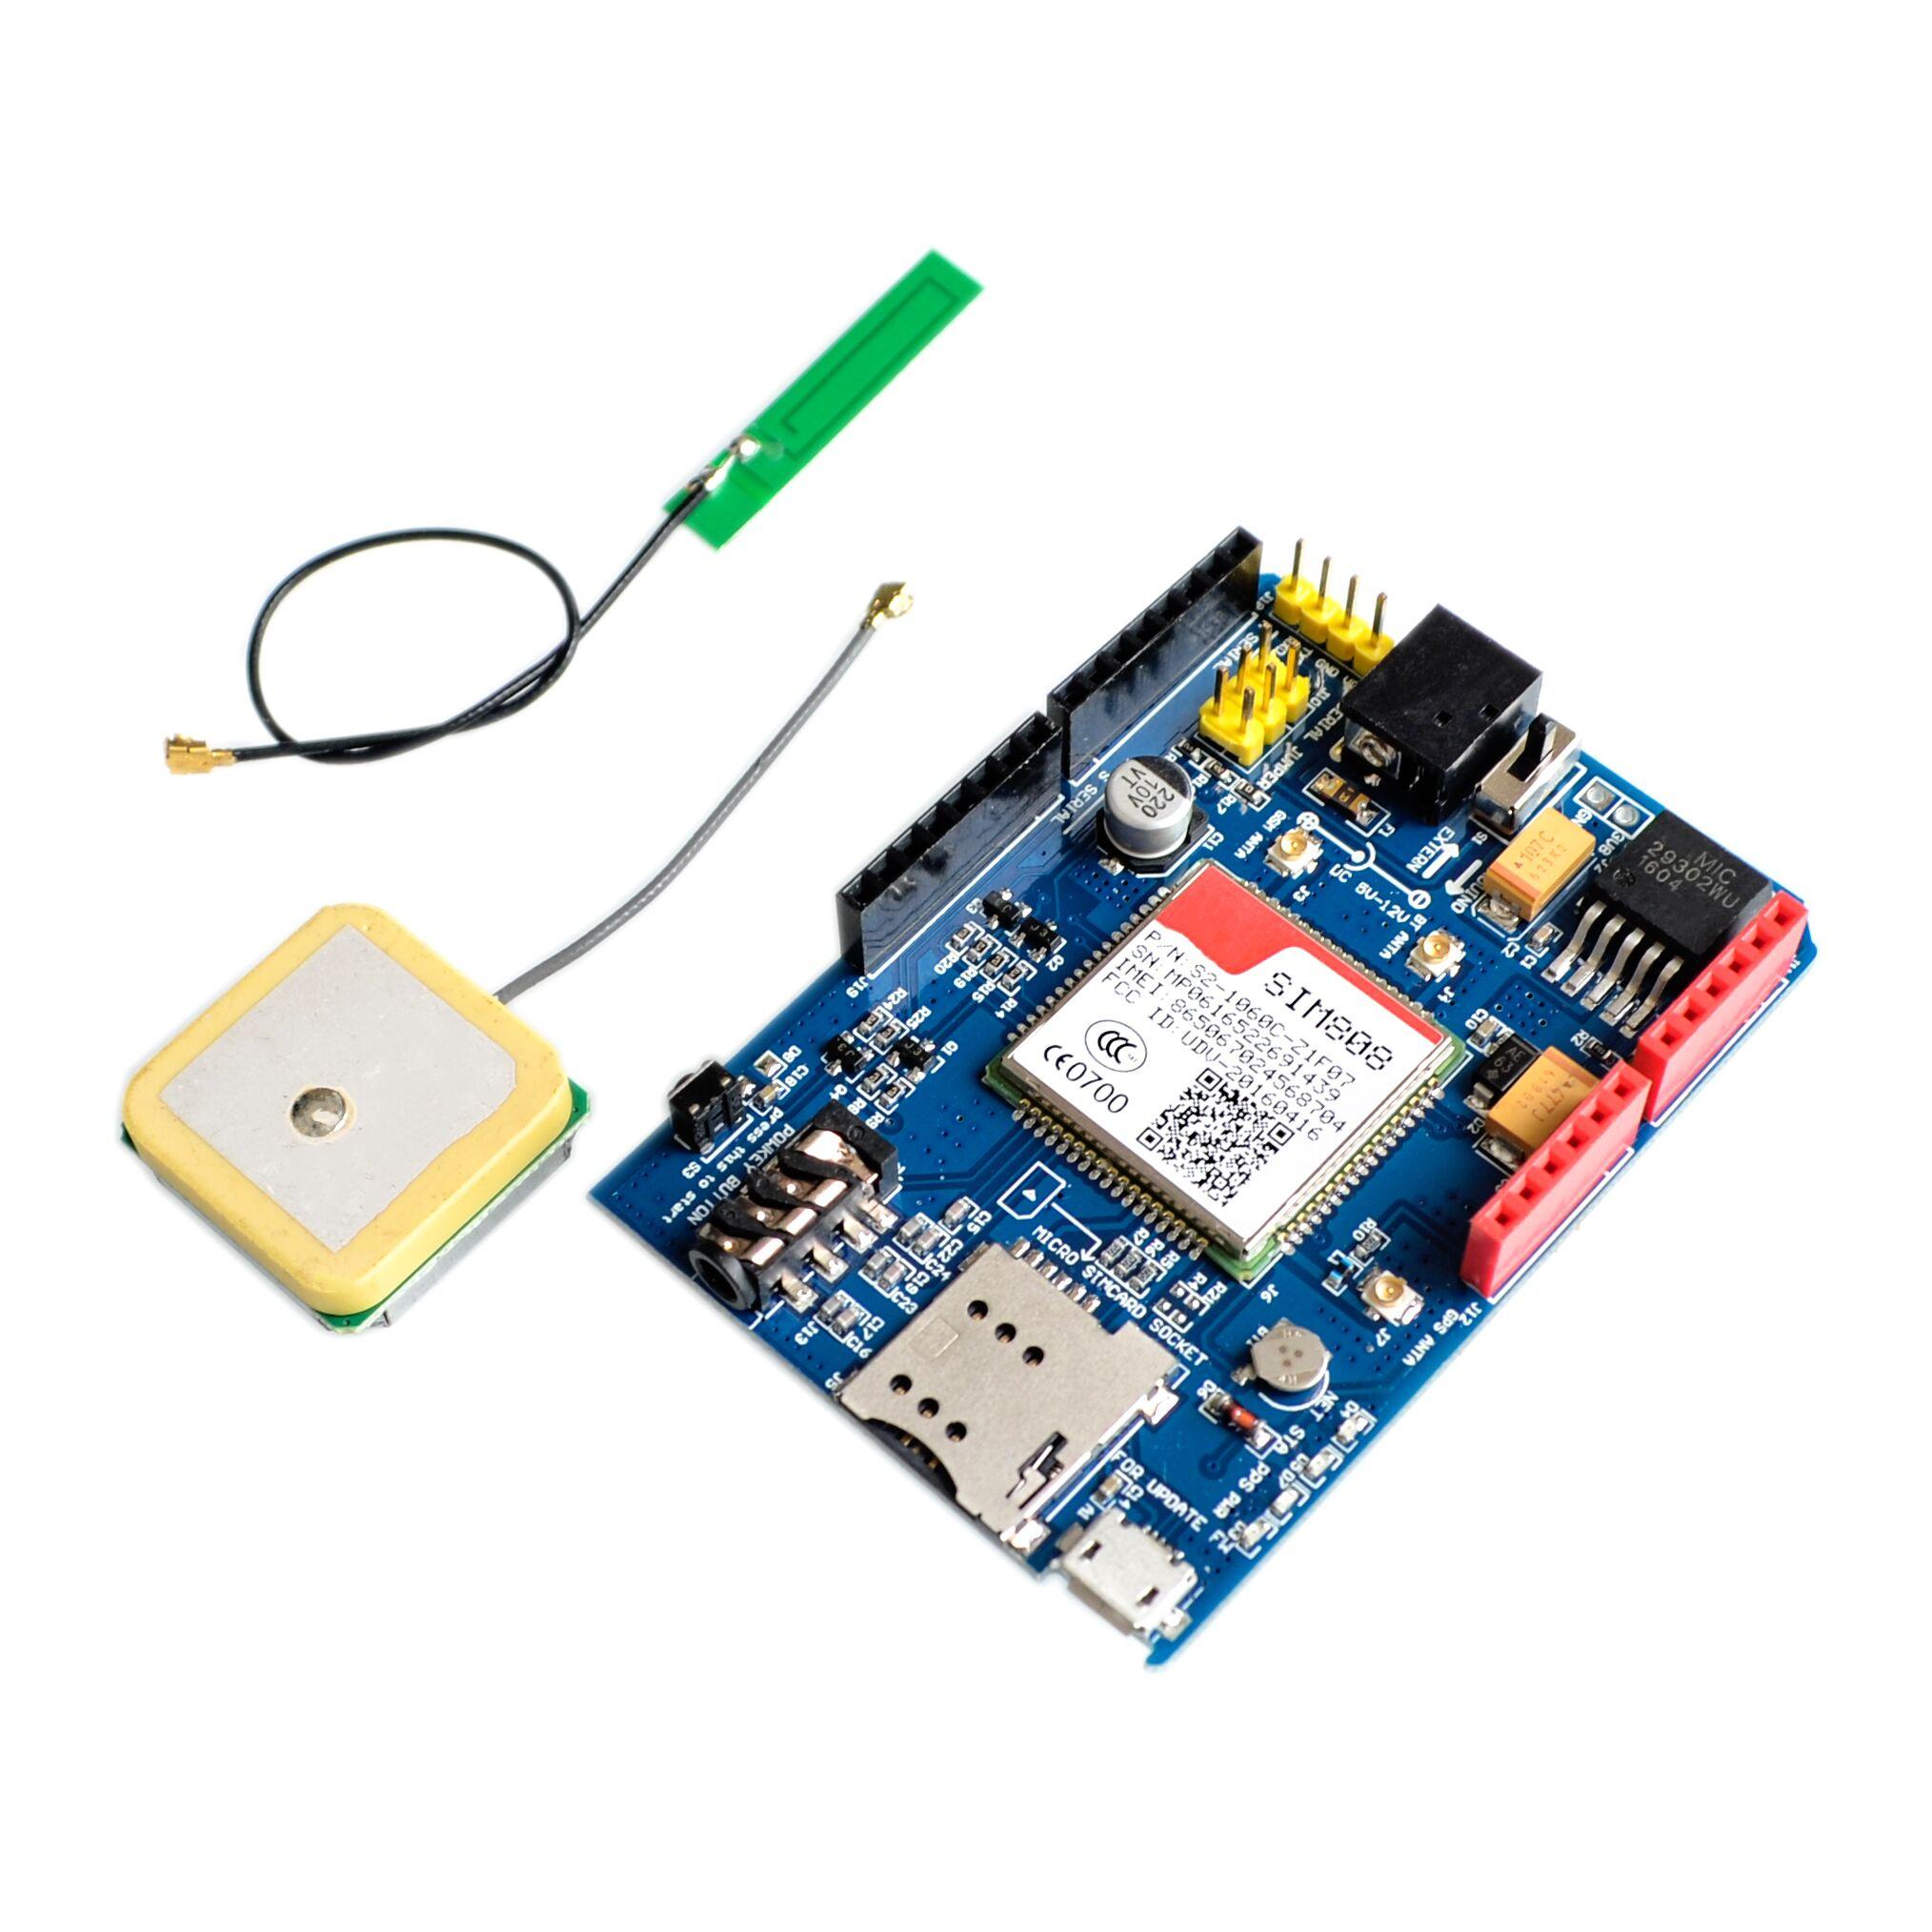 High Quality SIM808 GPRS/GSM+GPS Shield 2 in 1 Shield GSM GPRS GPS Development Board SIM808 Module forHigh Quality SIM808 GPRS/GSM+GPS Shield 2 in 1 Shield GSM GPRS GPS Development Board SIM808 Module for